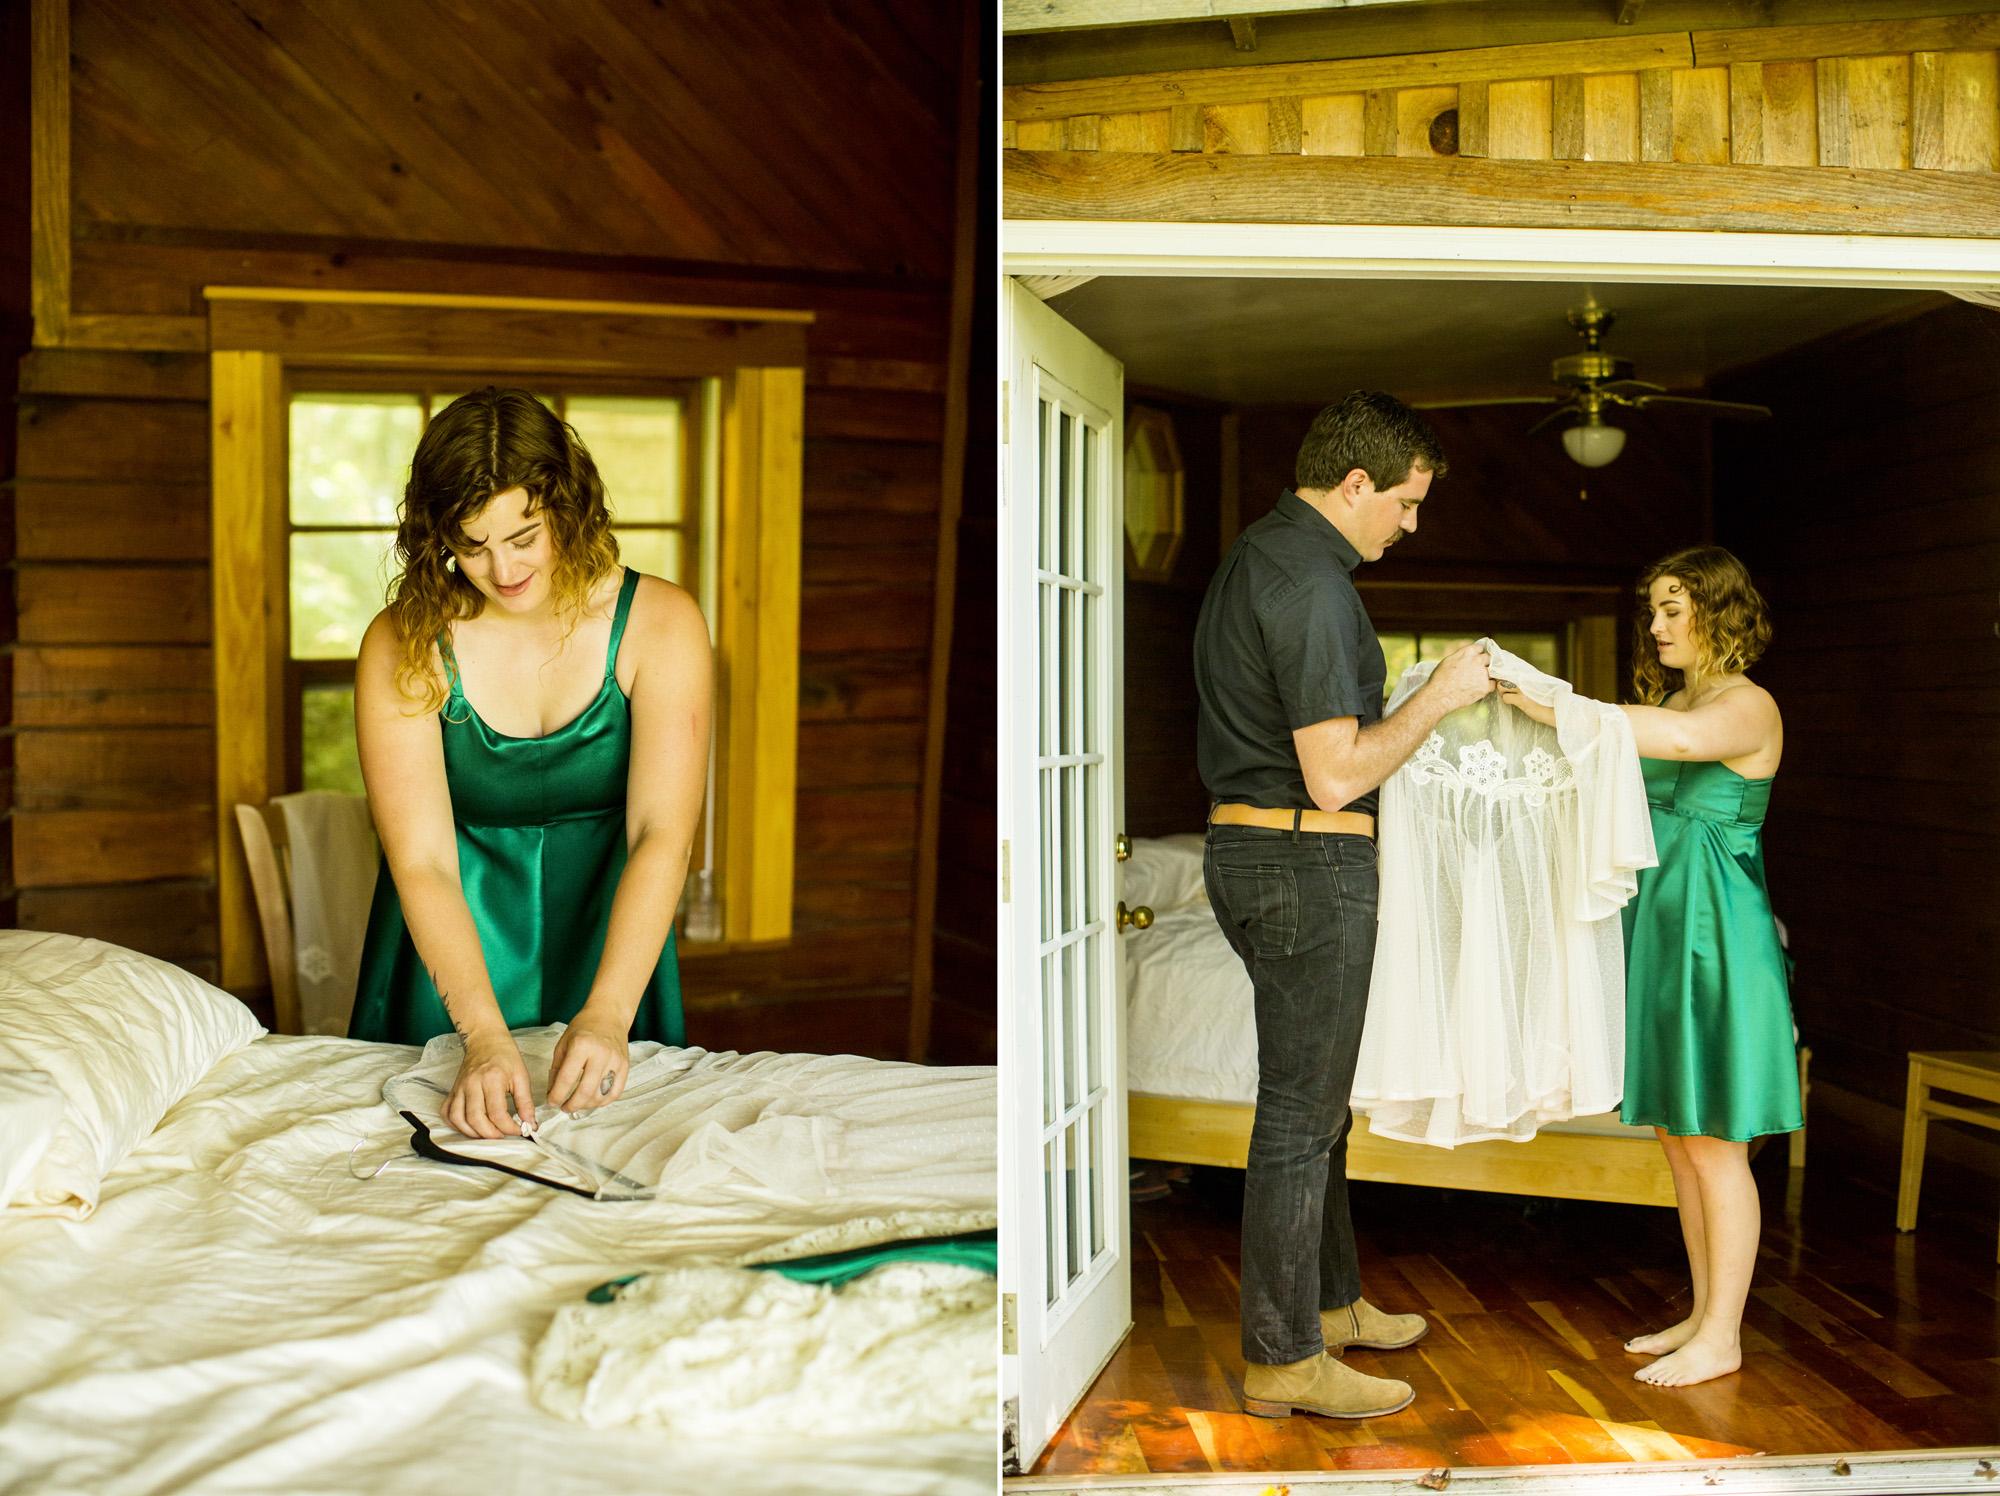 Seriously_Sabrina_Photography_Red_River_Gorge_Kentucky_Wedding_ShawnDana41.jpg